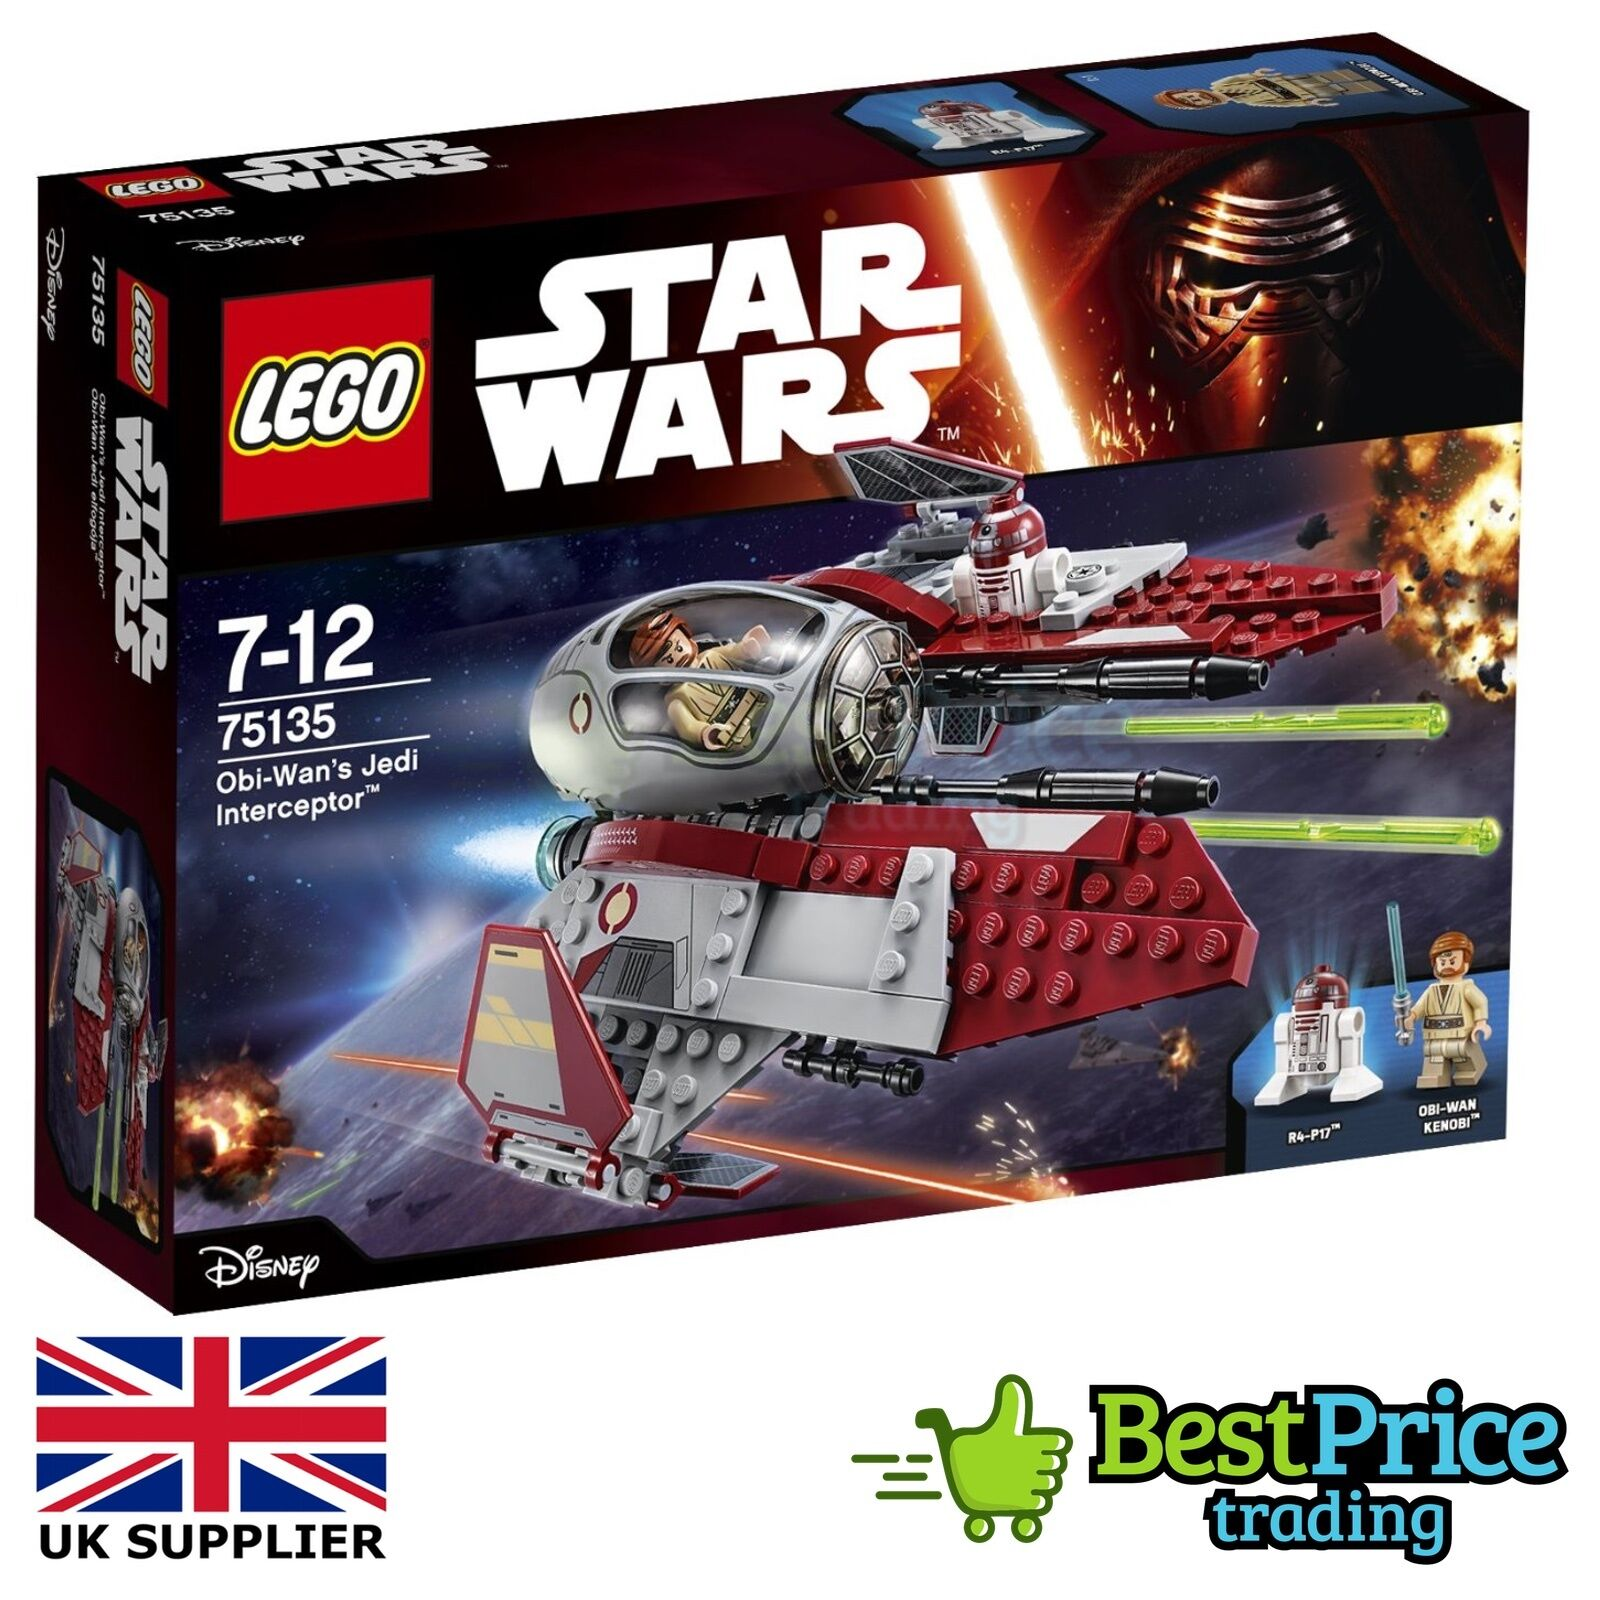 Lego Star Wars 75135 Obi-Wan's Jedi Interceptor BRAND NEW & SEALED Kenobi